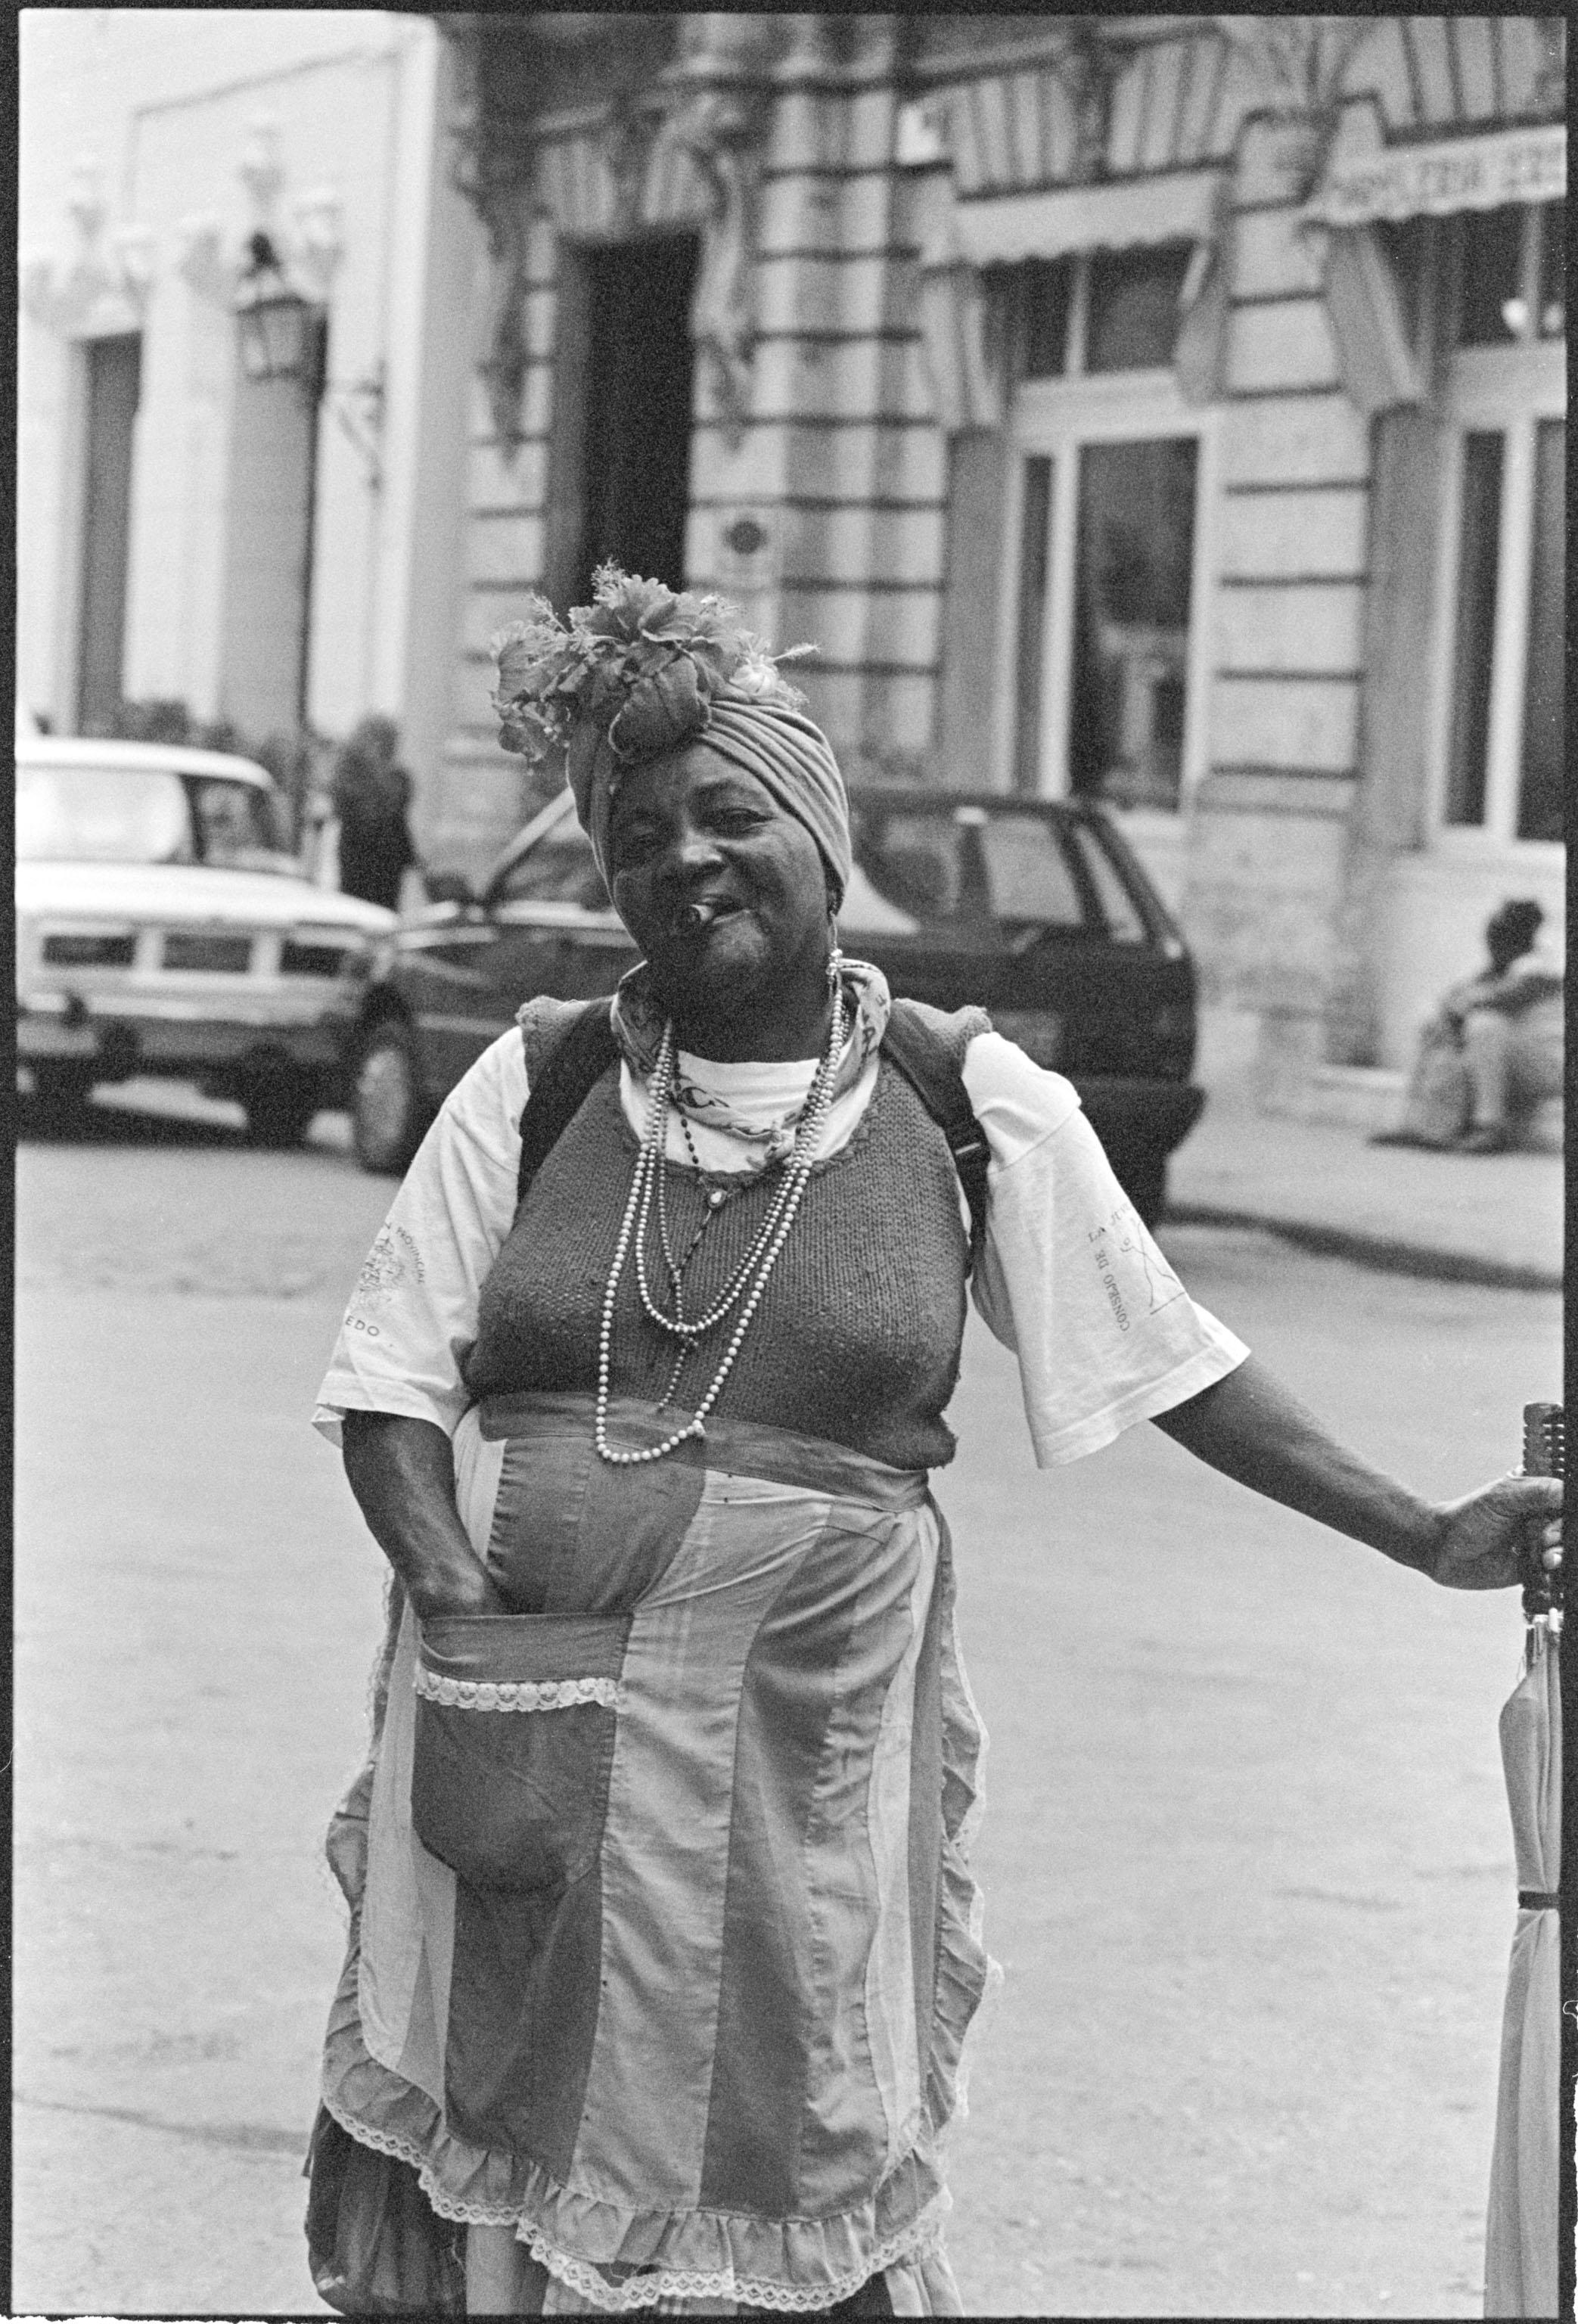 CUBA_HAVANA_1A-10